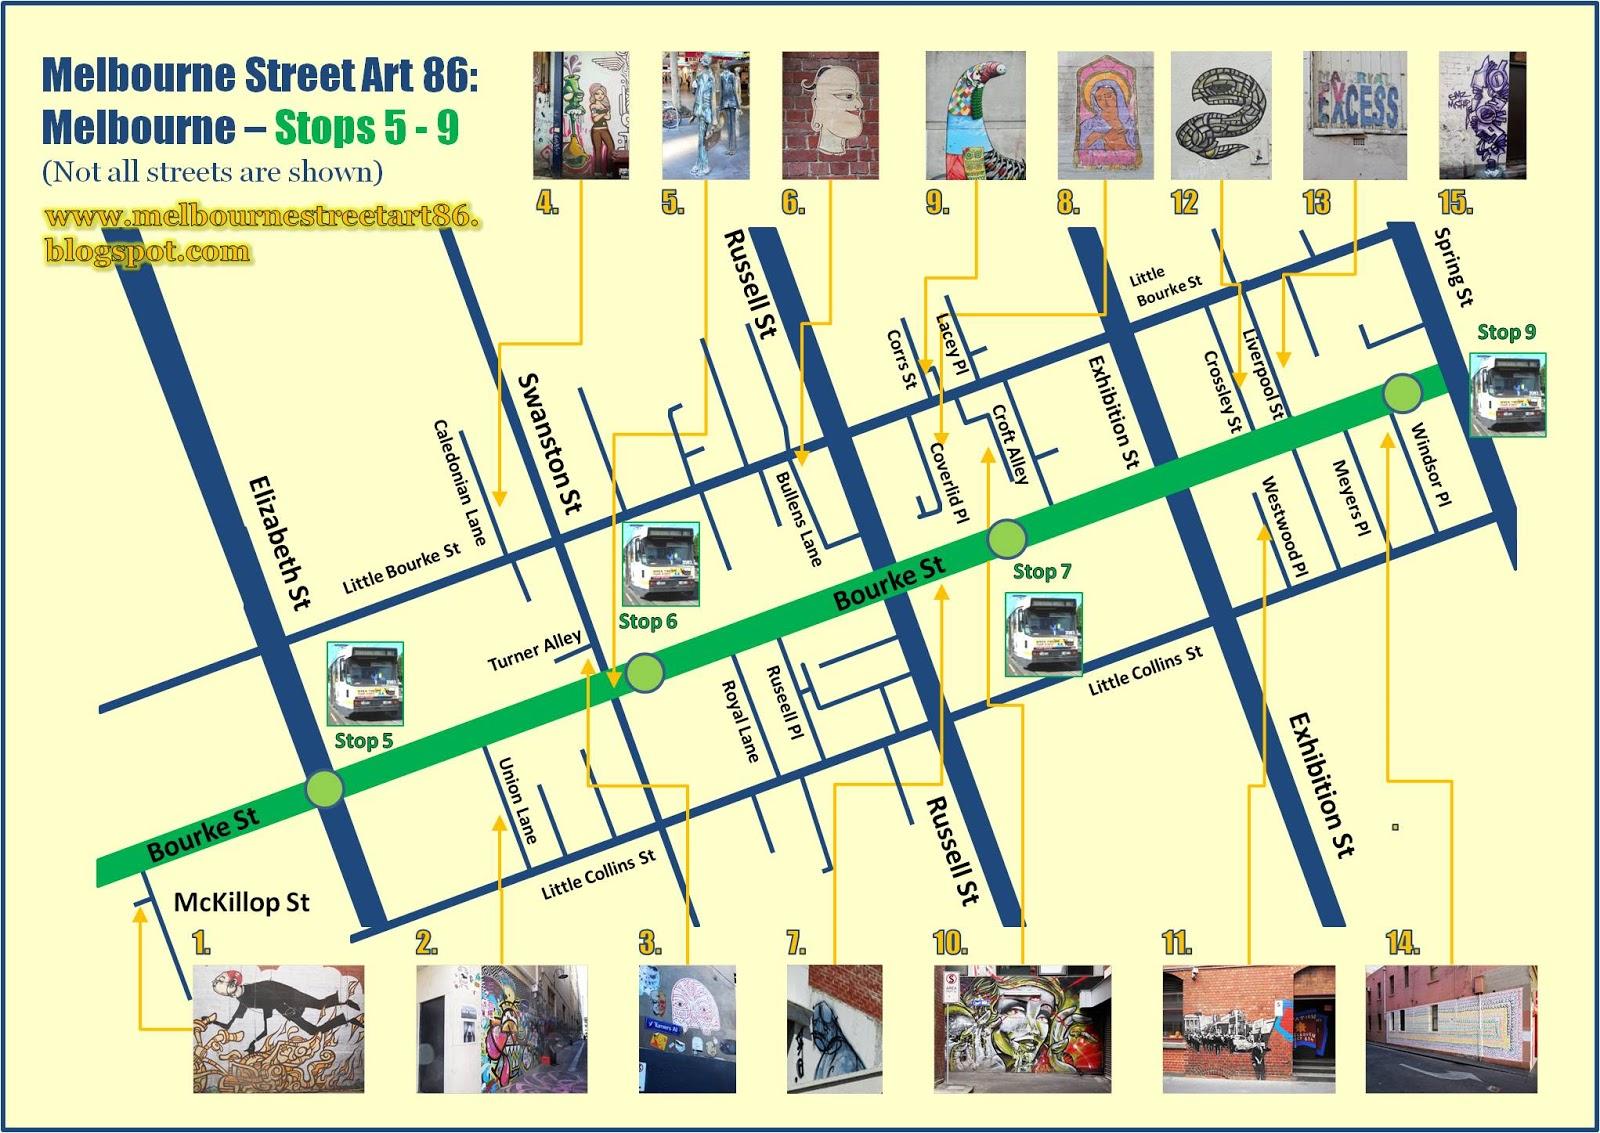 Melbourne Street Art Map Melbourne Street Art Map | compressportnederland Melbourne Street Art Map